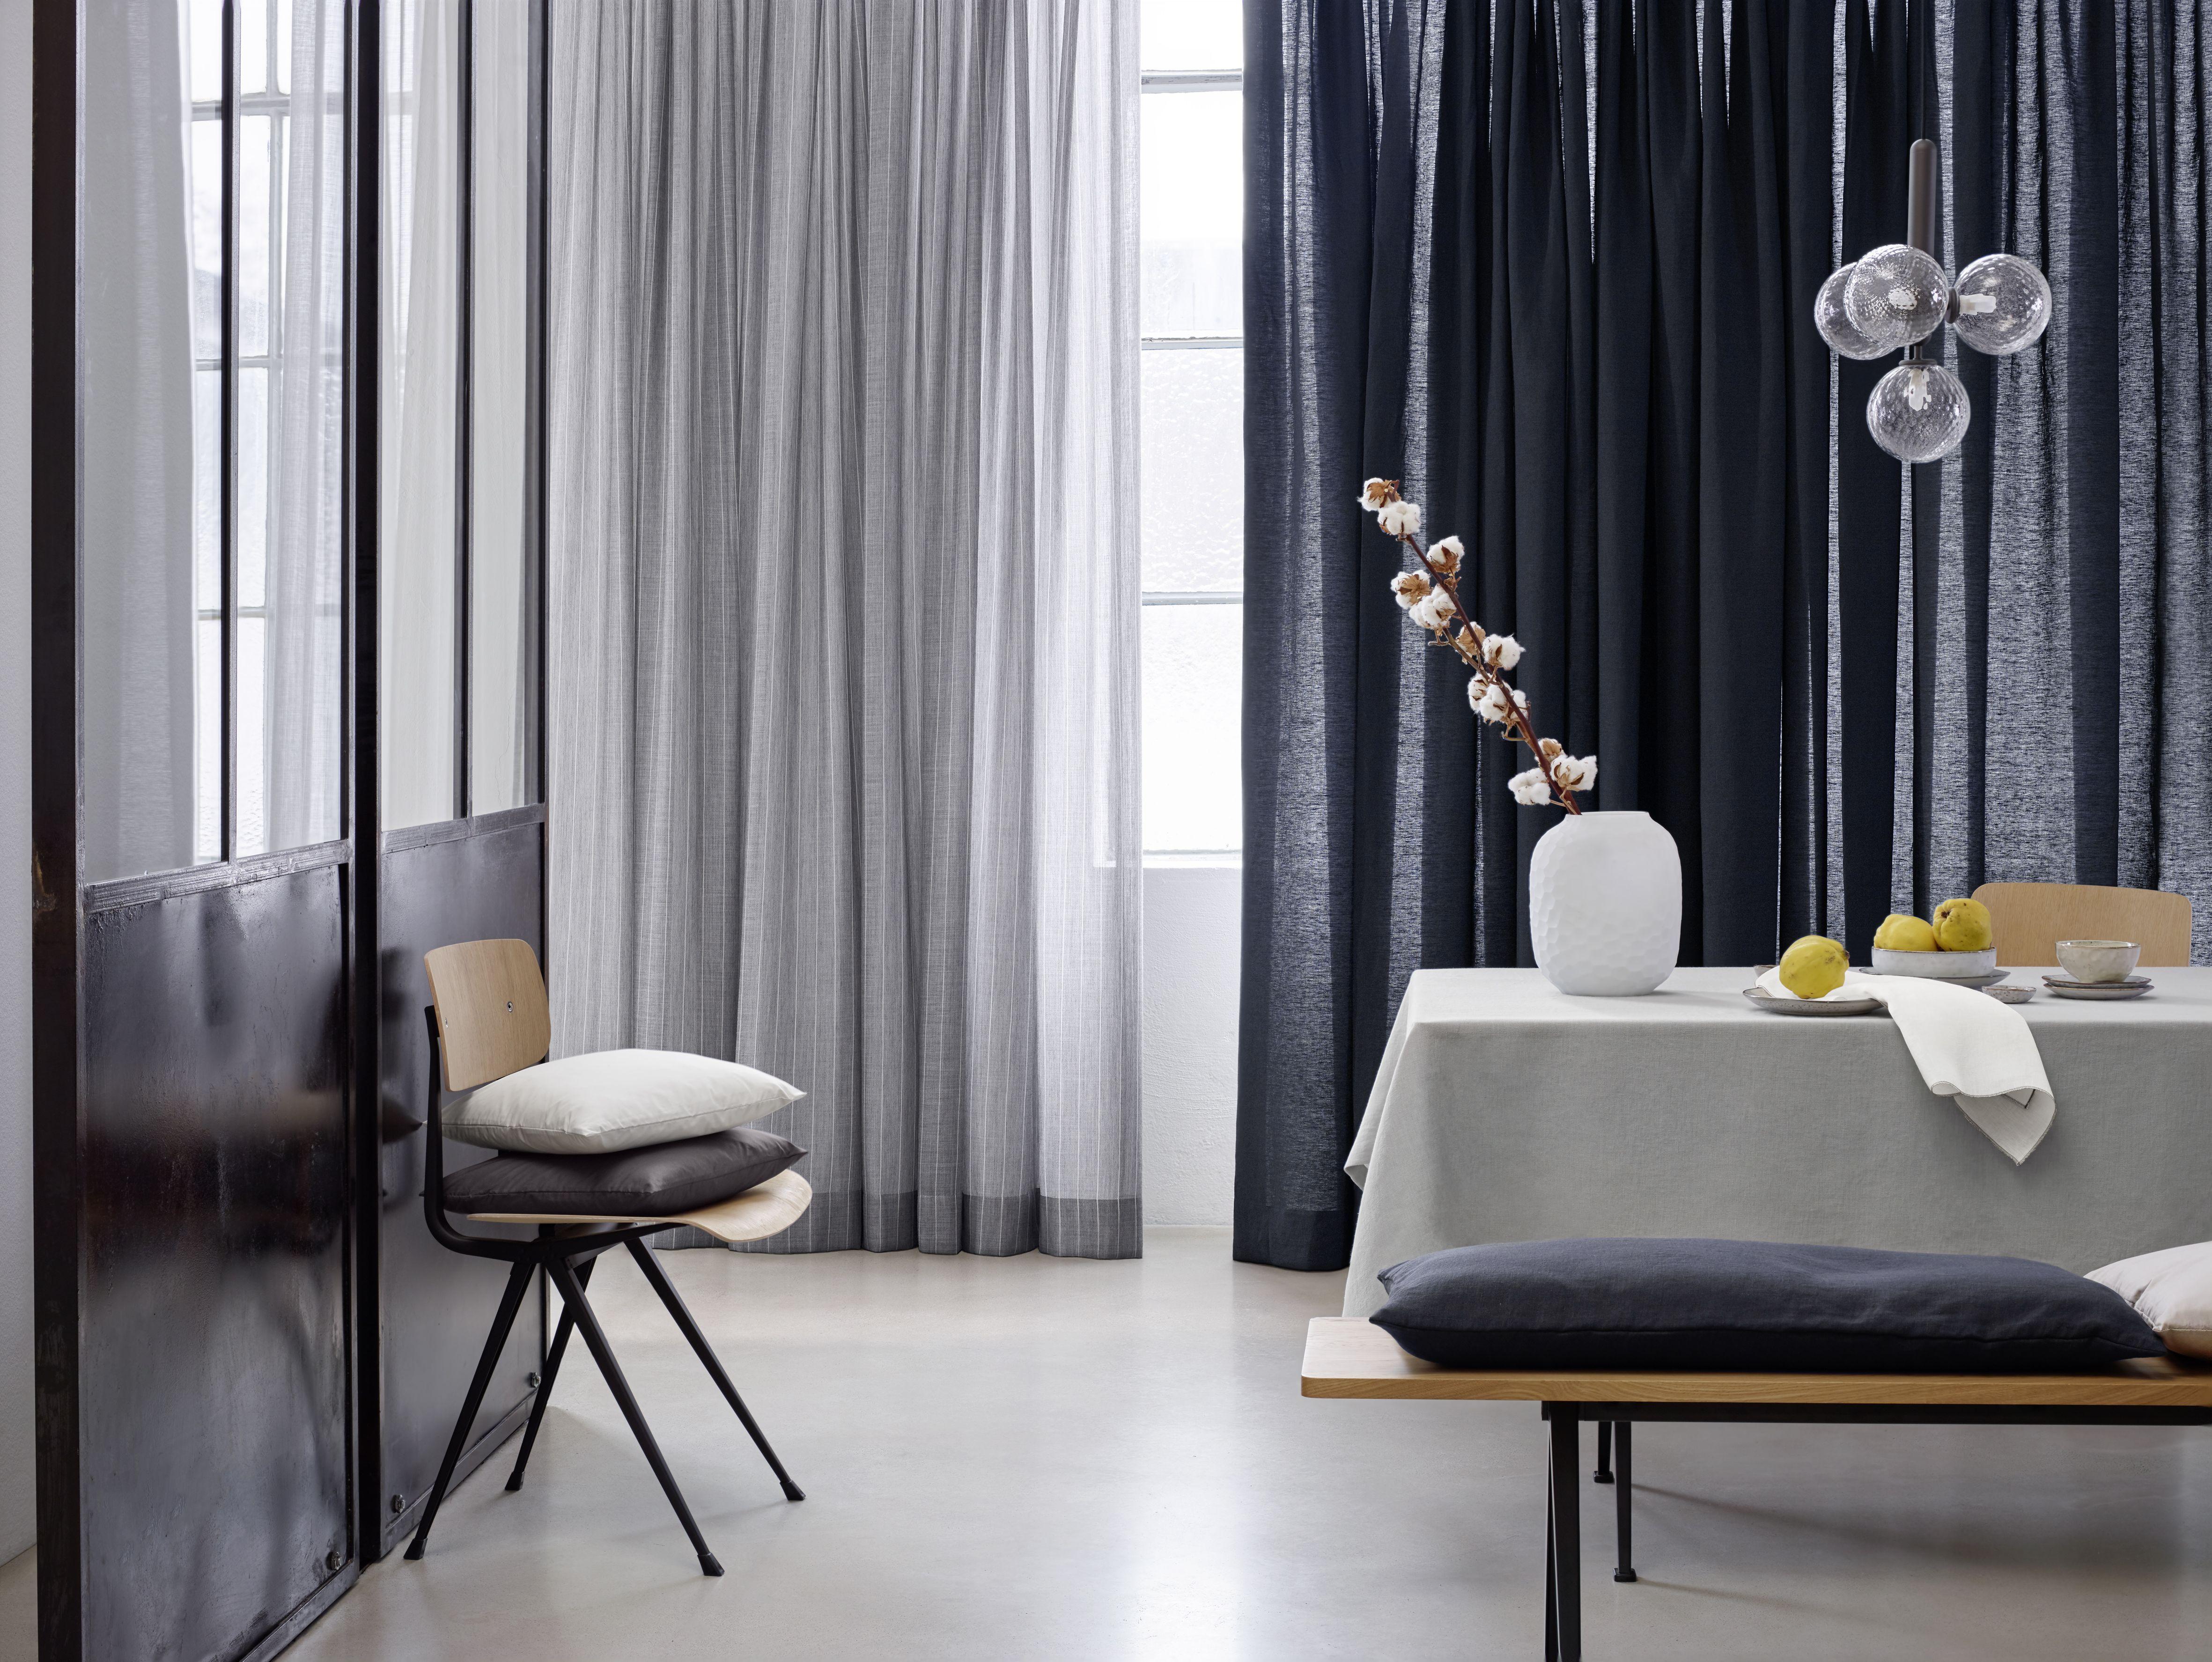 nya nordiska mobilier design decoration maison mobilier